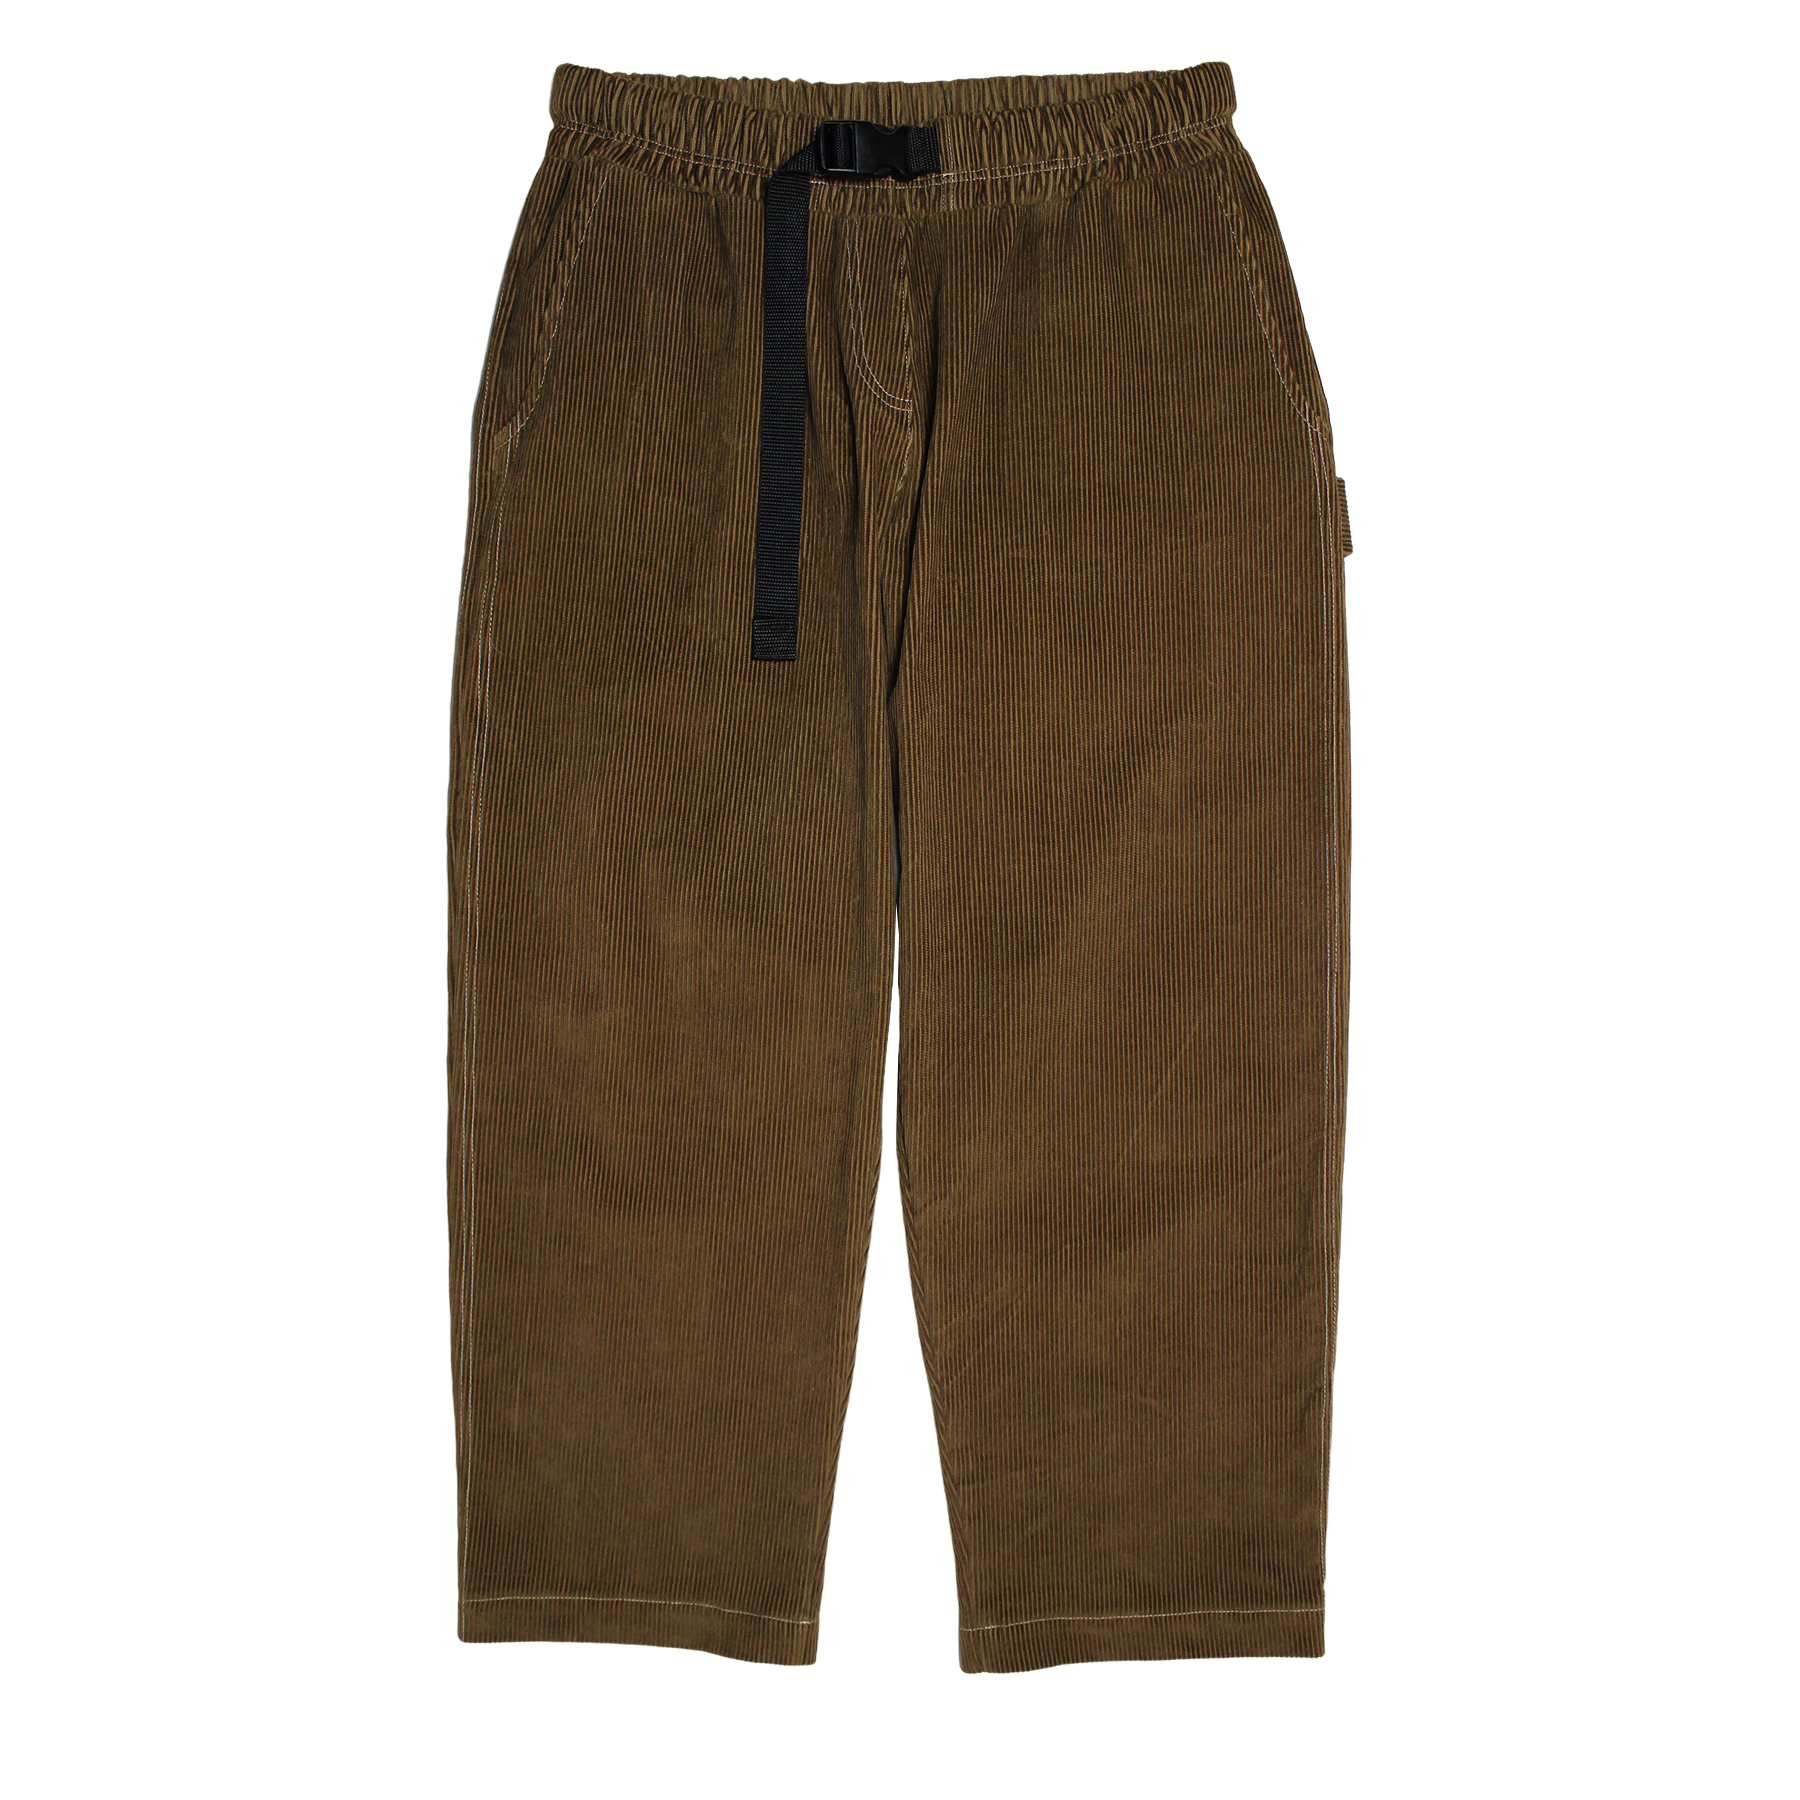 Nolan Couture NTS Corduroy pant brown Front.jpg